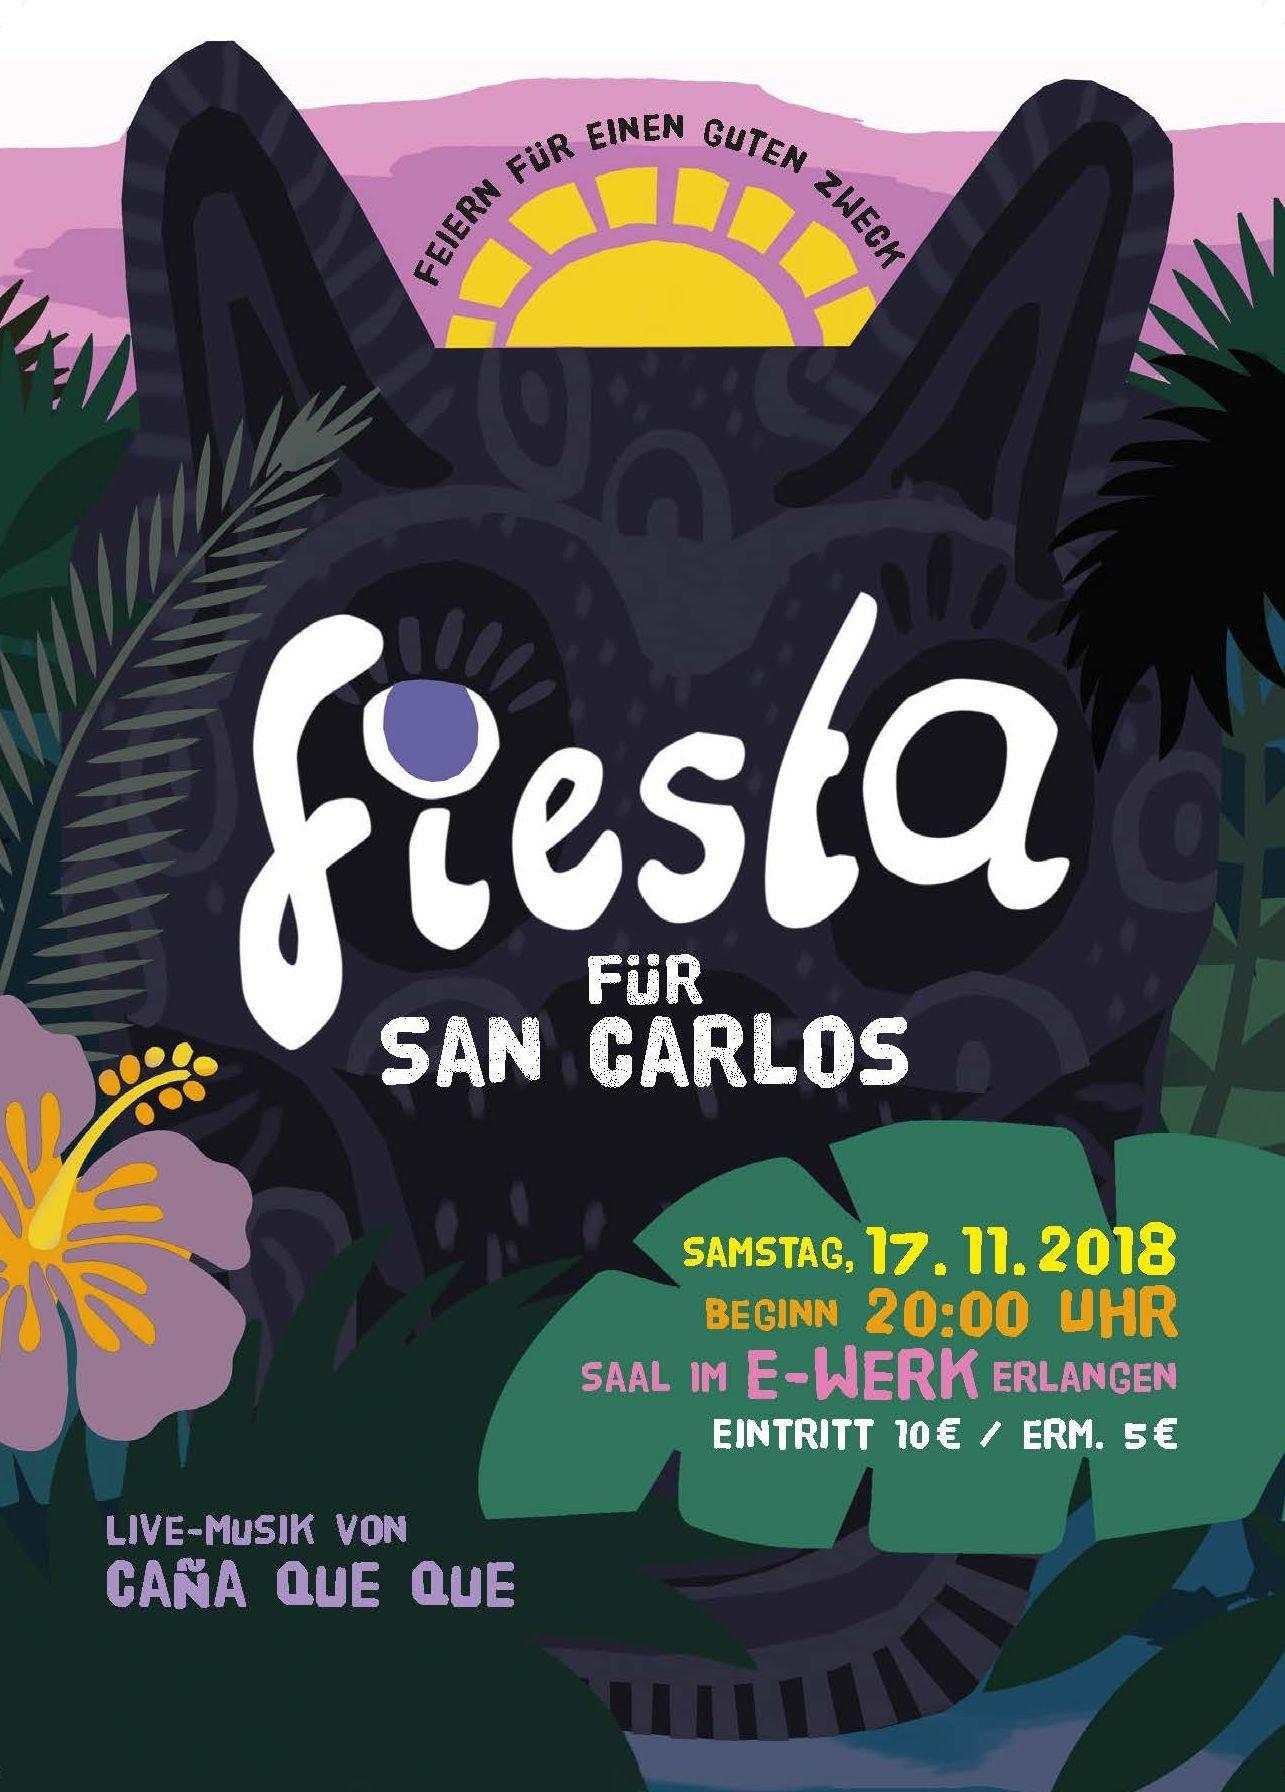 Fiesta für San Carlos - © Veranstalter